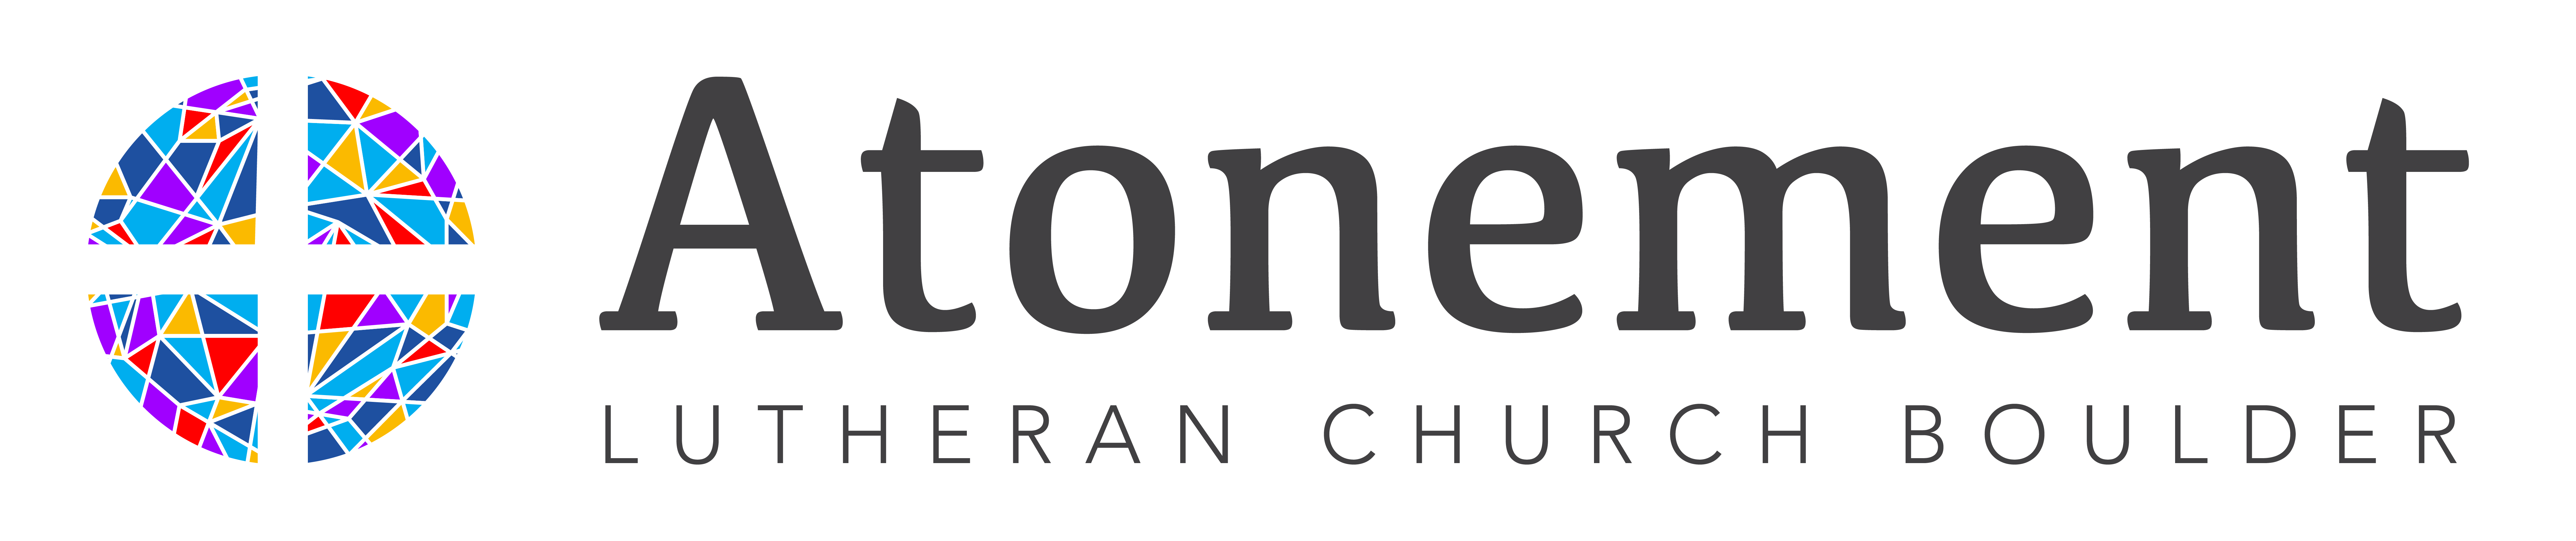 Atonement Lutheran Church Boulder